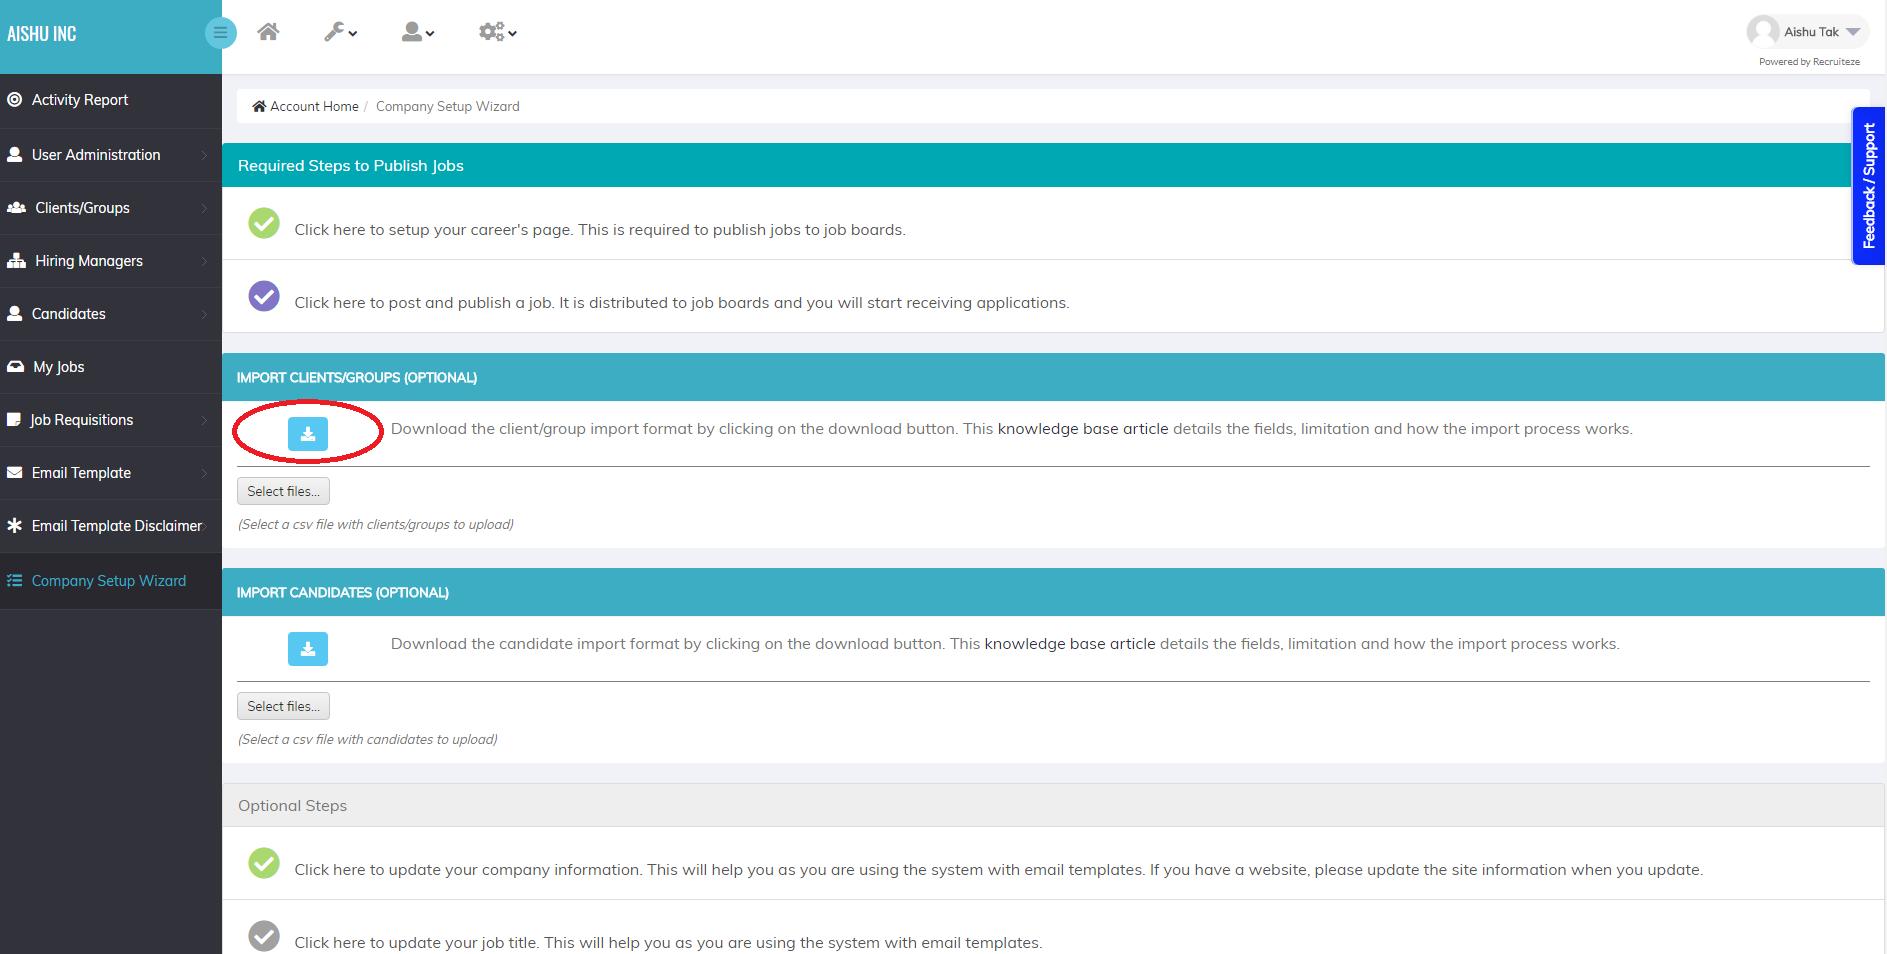 Recruiteze Applicant Tracking System Client Import Format